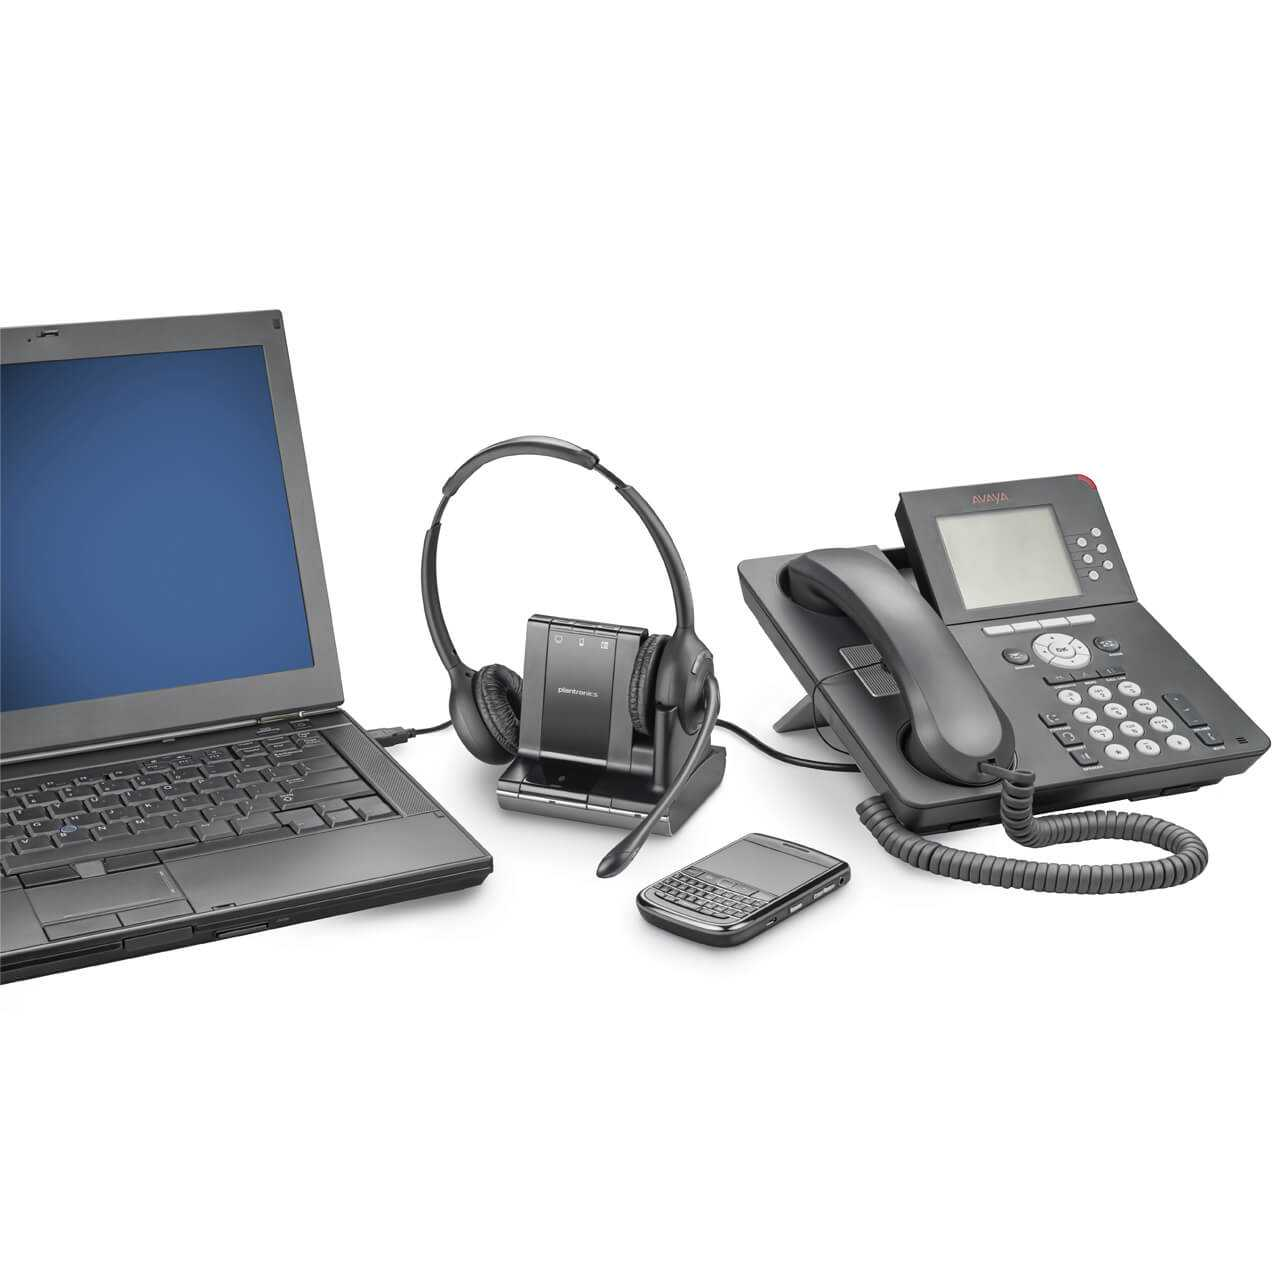 Plantronics savi w720 headset ERKAPLW720 0001 In Gebruik